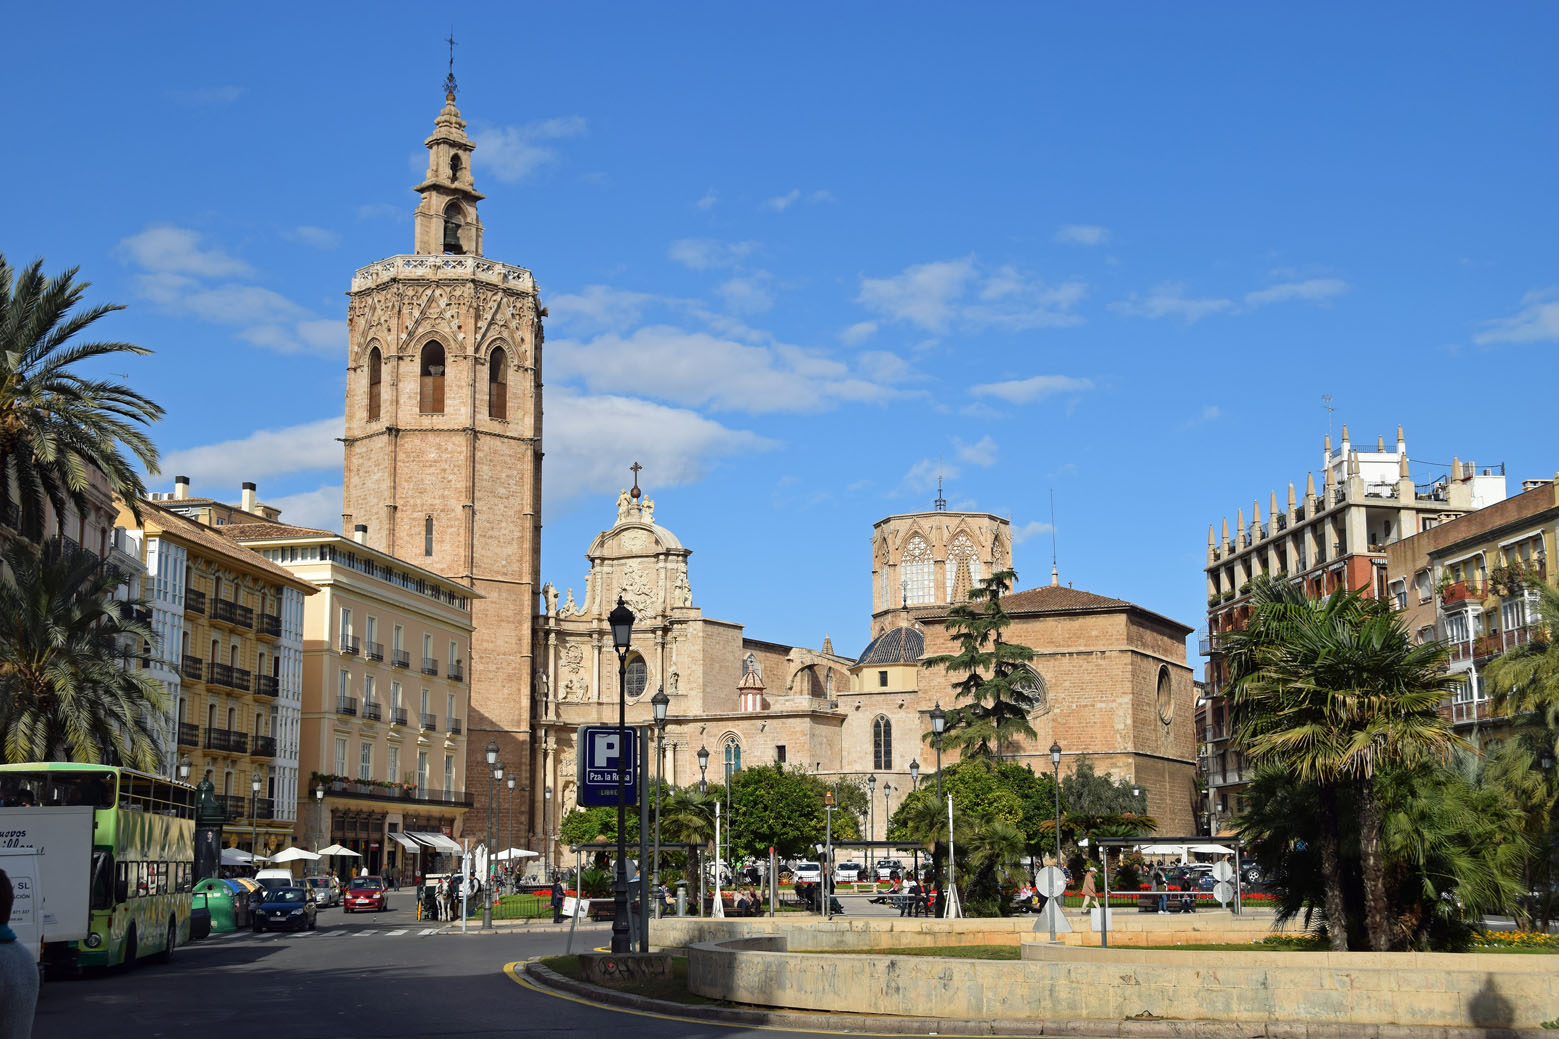 151214 History Talk 14th Dec: Valencia: the Biography of a City